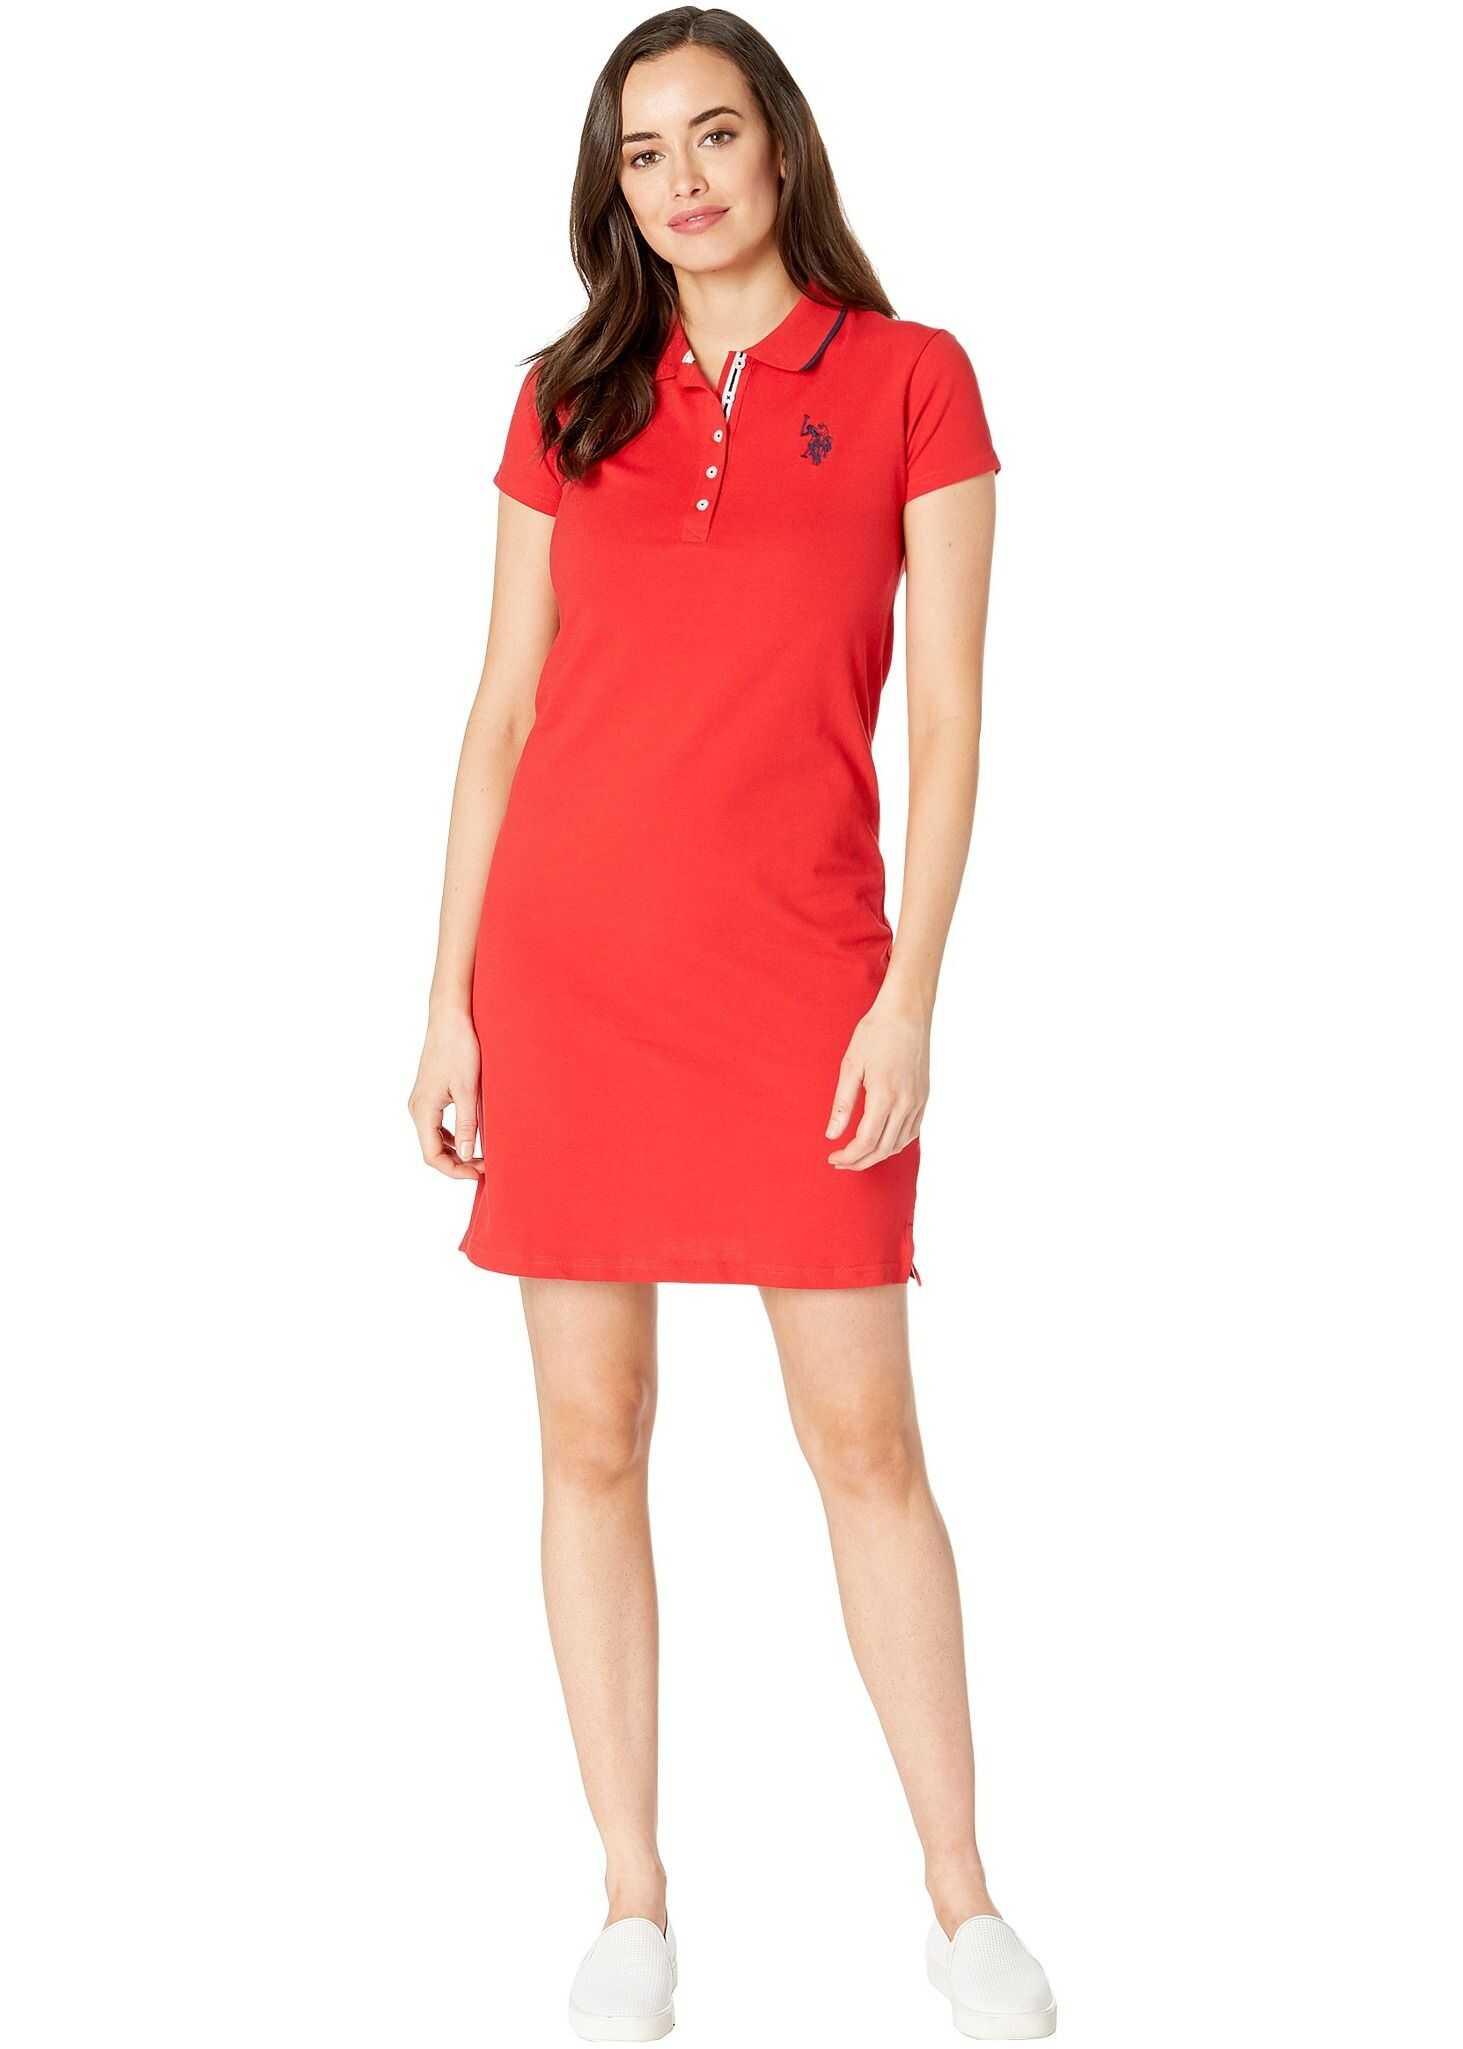 U.S. POLO ASSN. Plain Polo Dress Racing Red